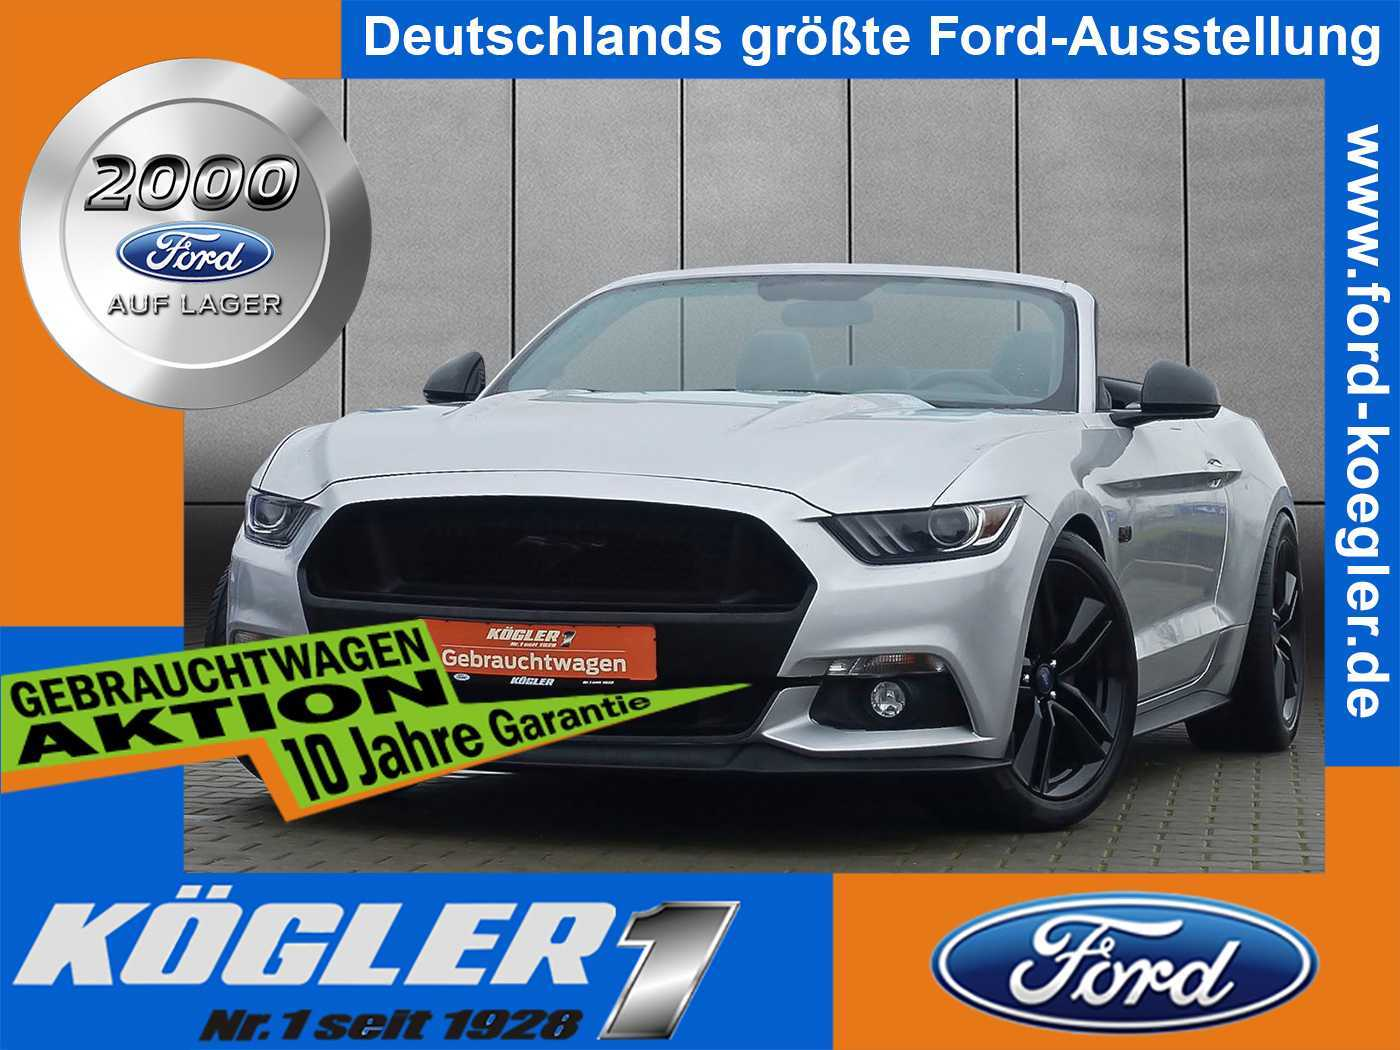 Ford Mustang Cabrio GT 5.0 Aut./Premium-Paket, Jahr 2017, Benzin